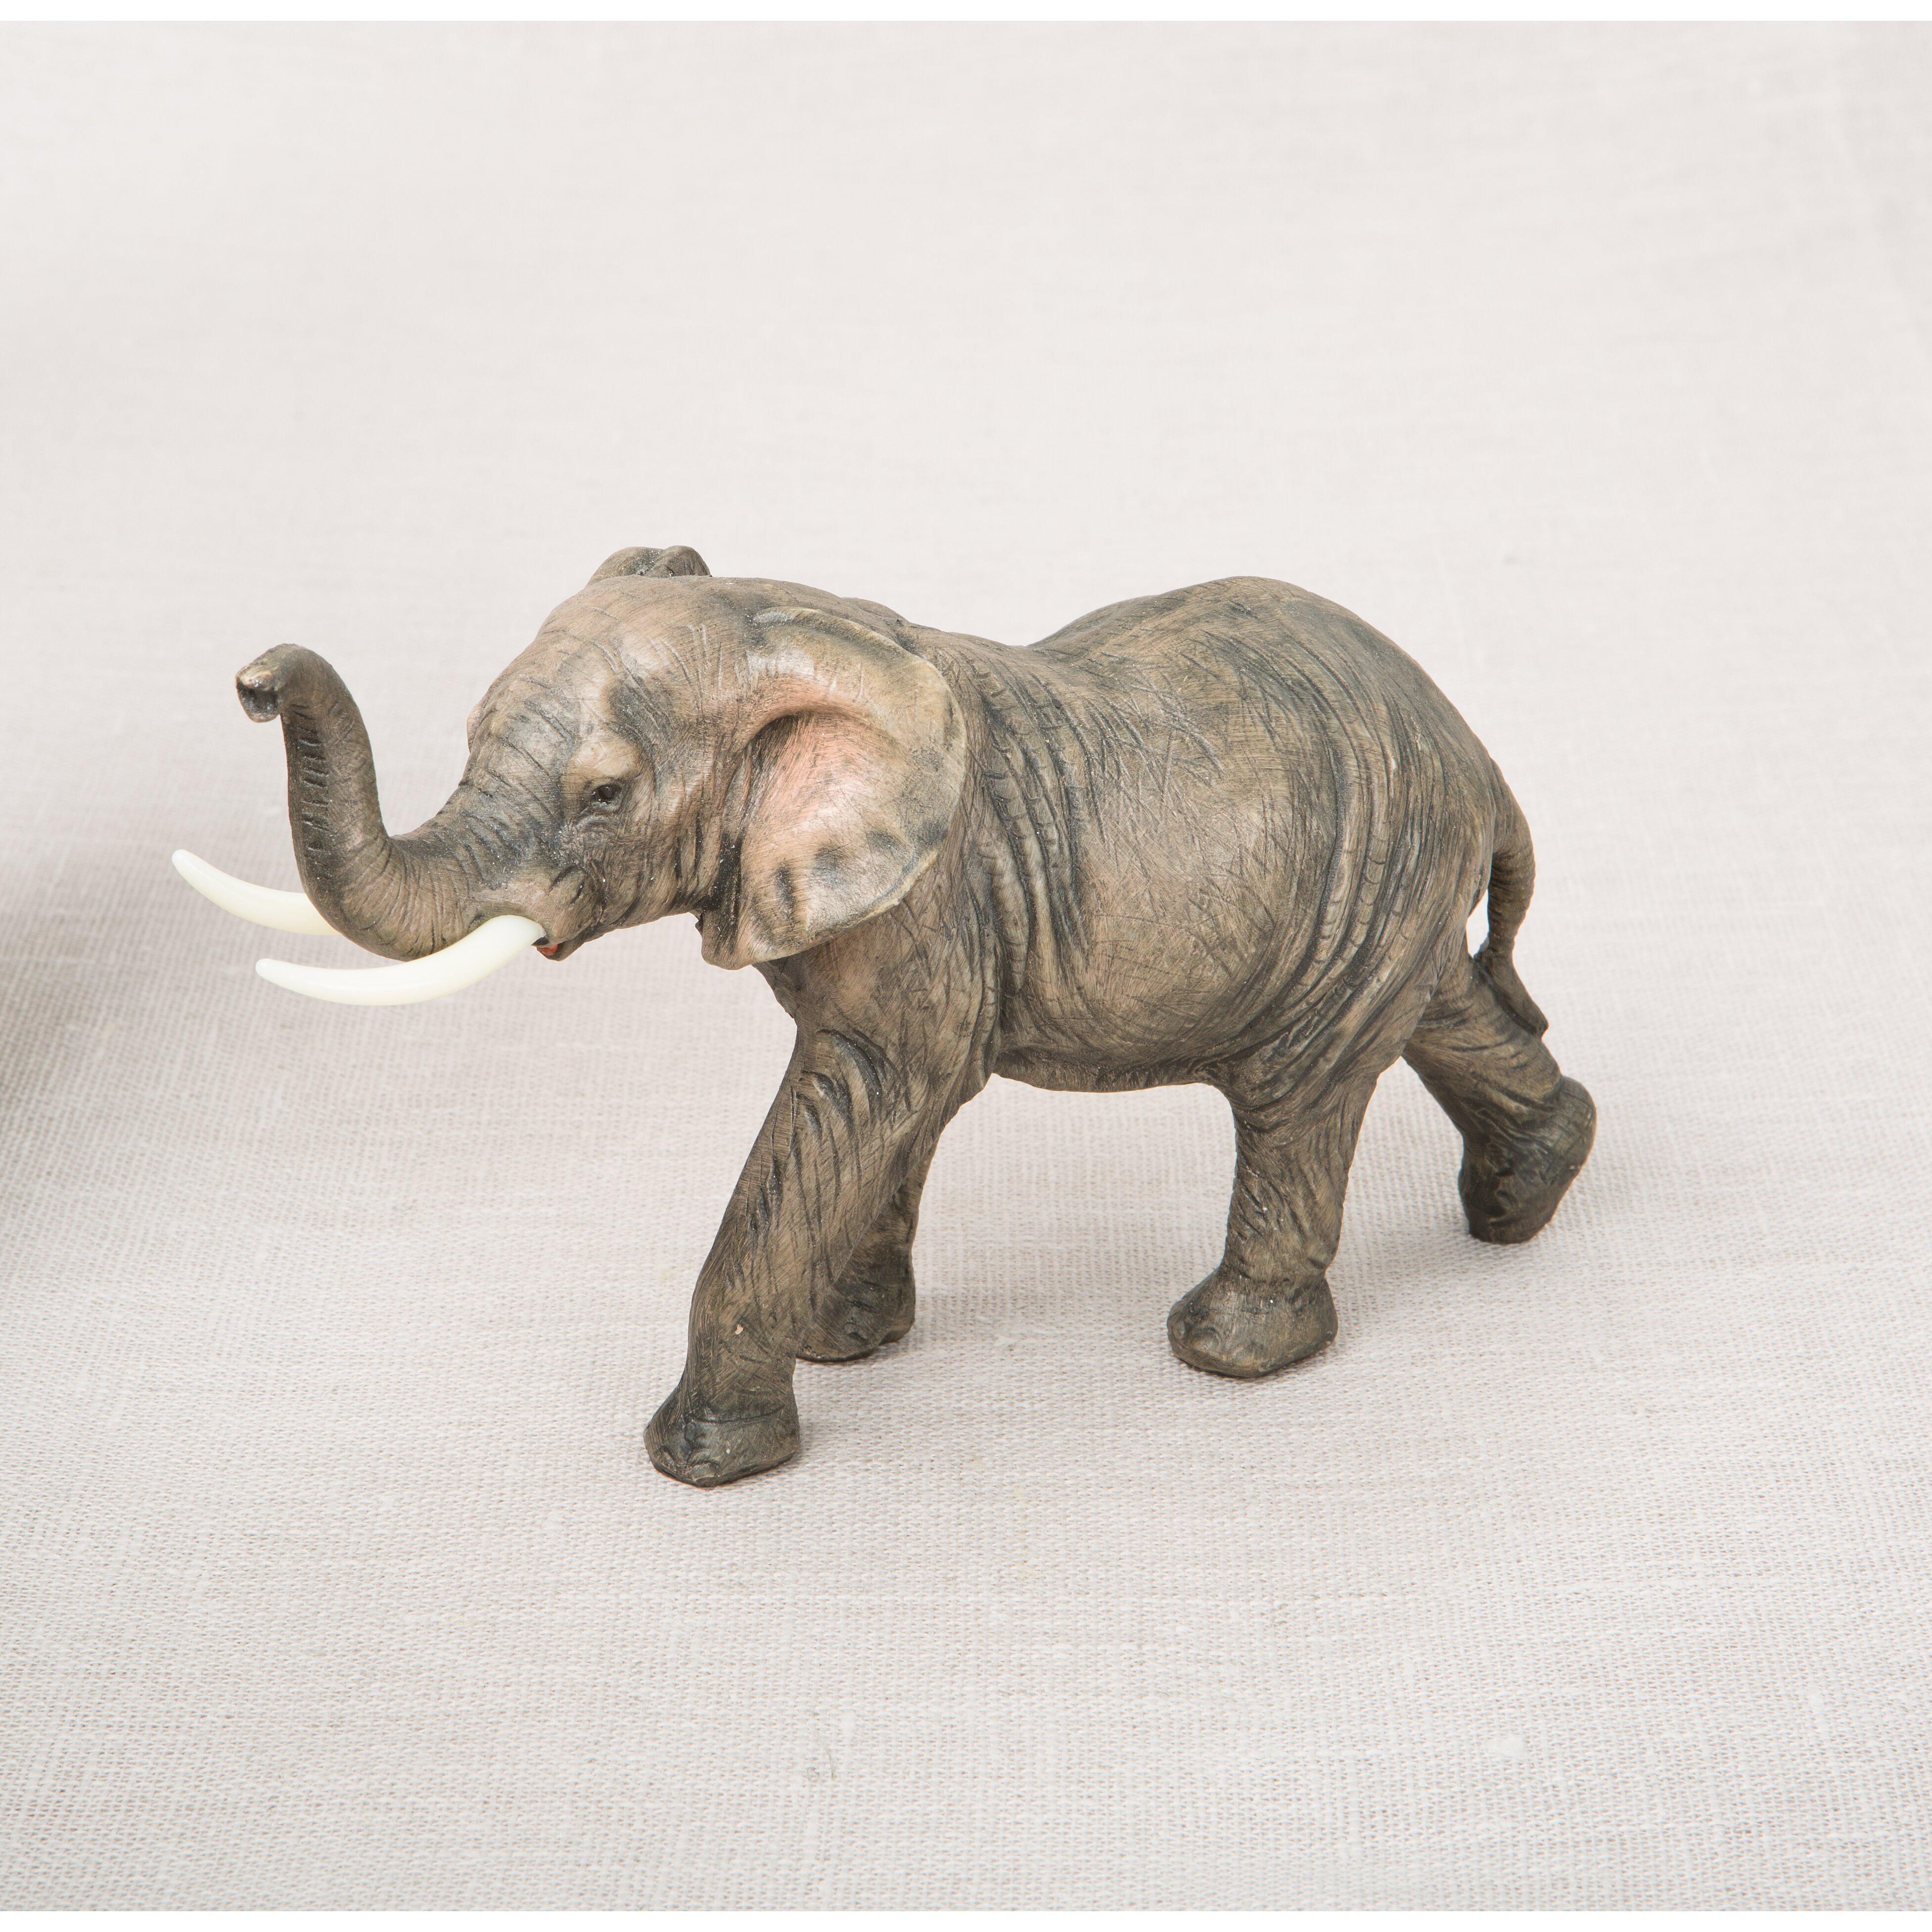 fashioncraft natural looking elephant figurine. Black Bedroom Furniture Sets. Home Design Ideas